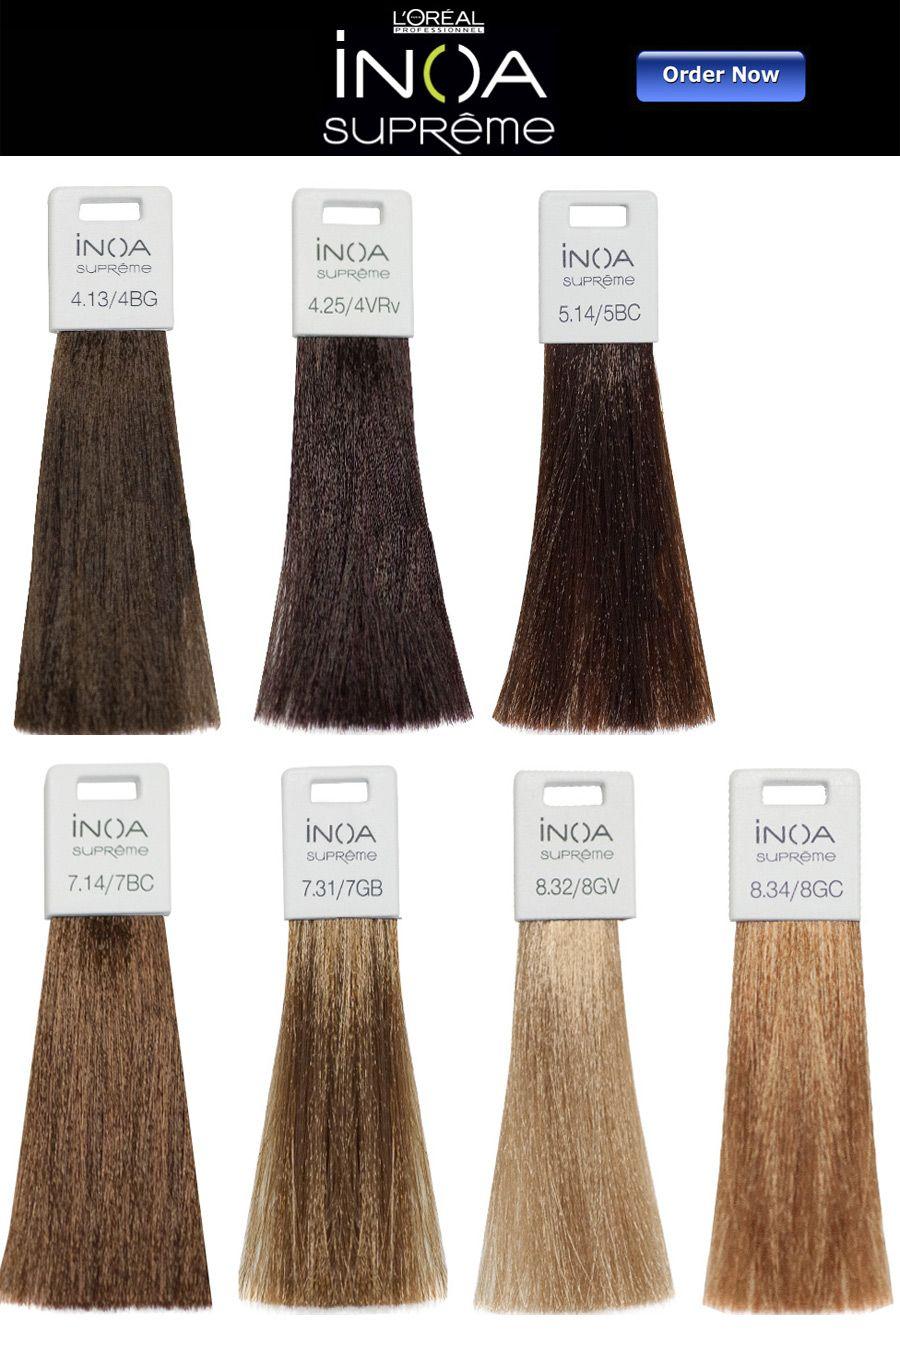 L Oreal Inoa Supreme Hair Color Chart In 2020 Loreal Hair Color Hair Color Chart Loreal Hair Dye